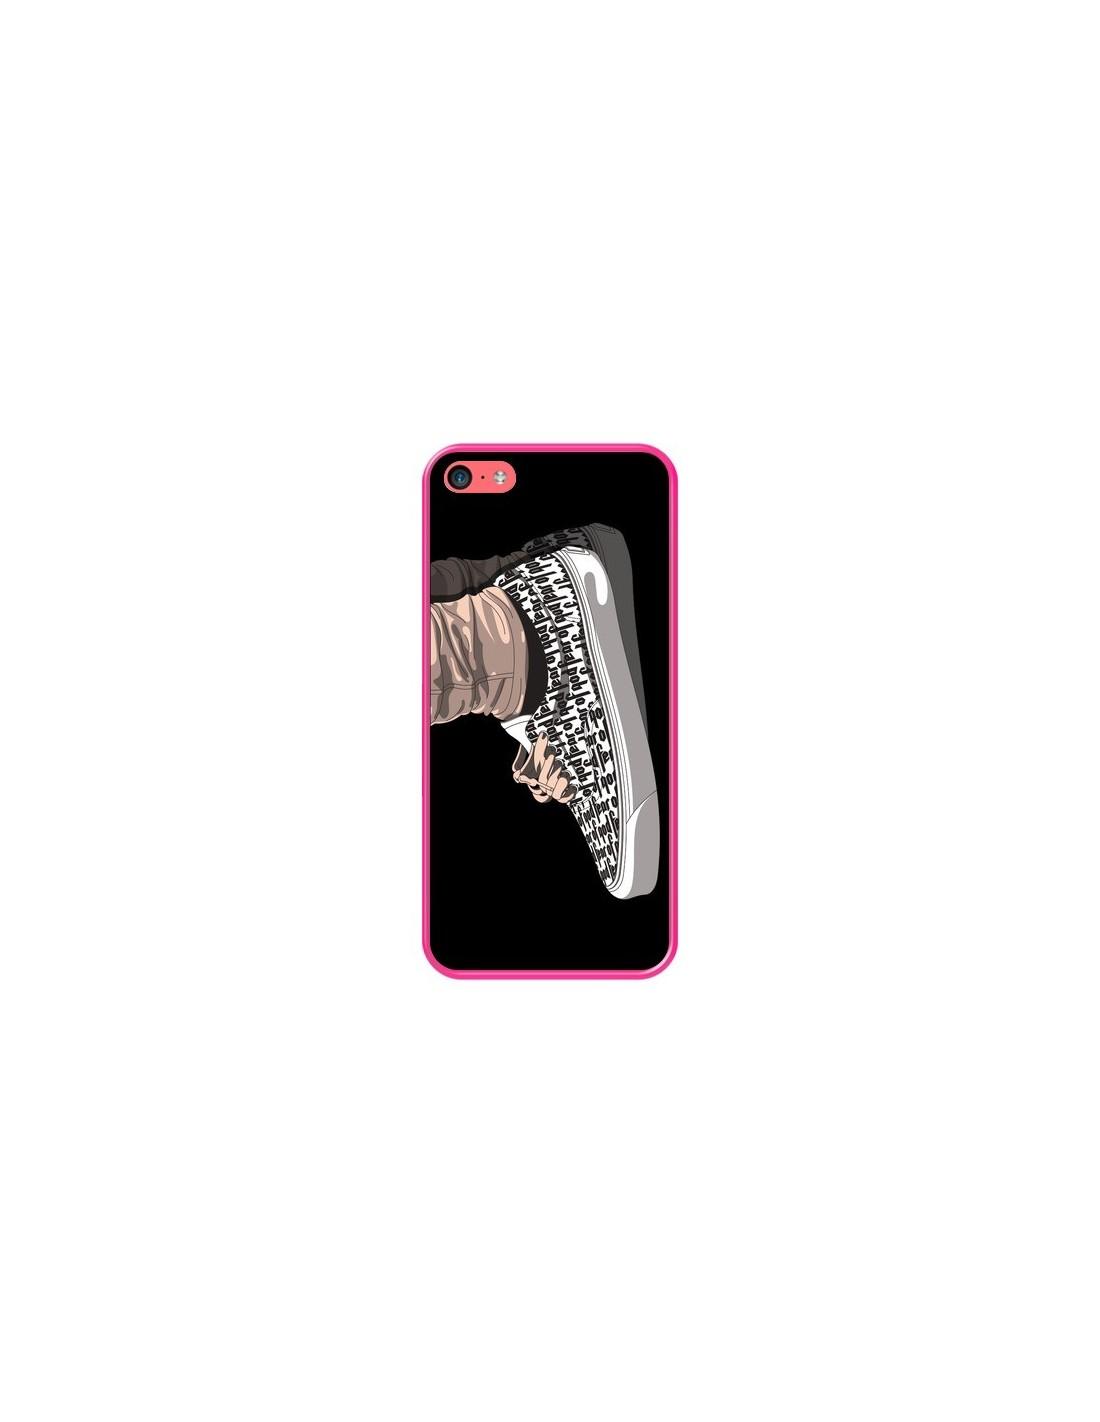 Coque iPhone 5C Vans Noir - Mikadololo